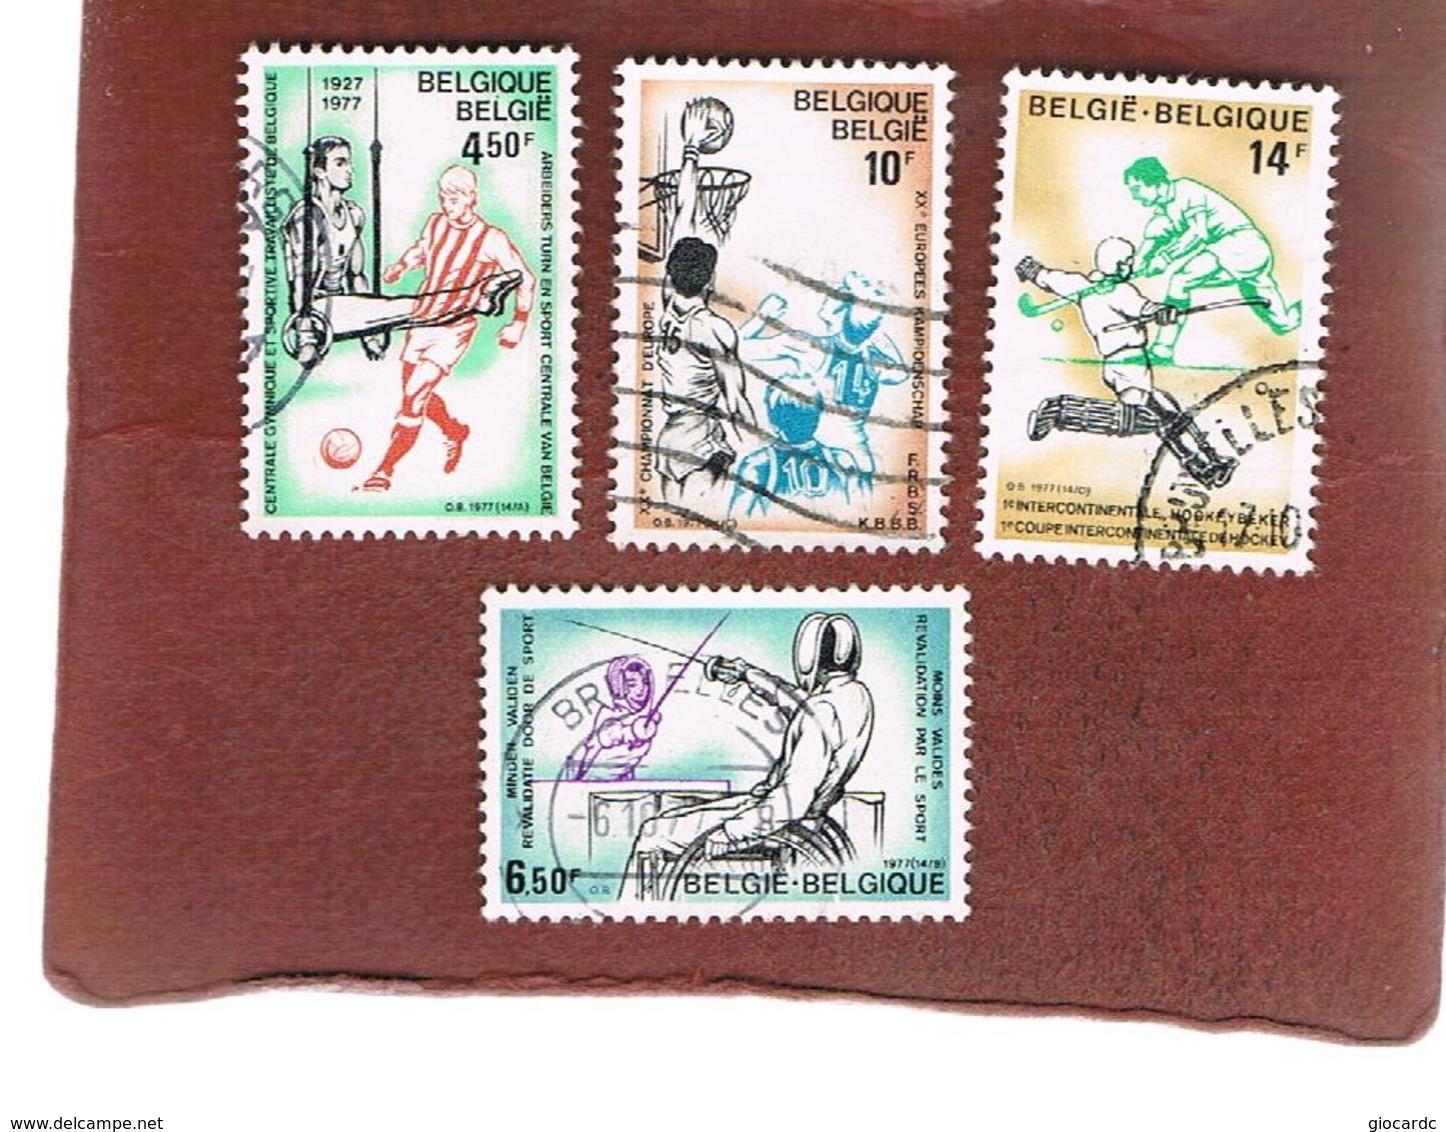 BELGIO (BELGIUM)   - SG 2500.2503  - 1977  SPORTS EVENTS (COMPLET SET OF 4) - USED - Belgio